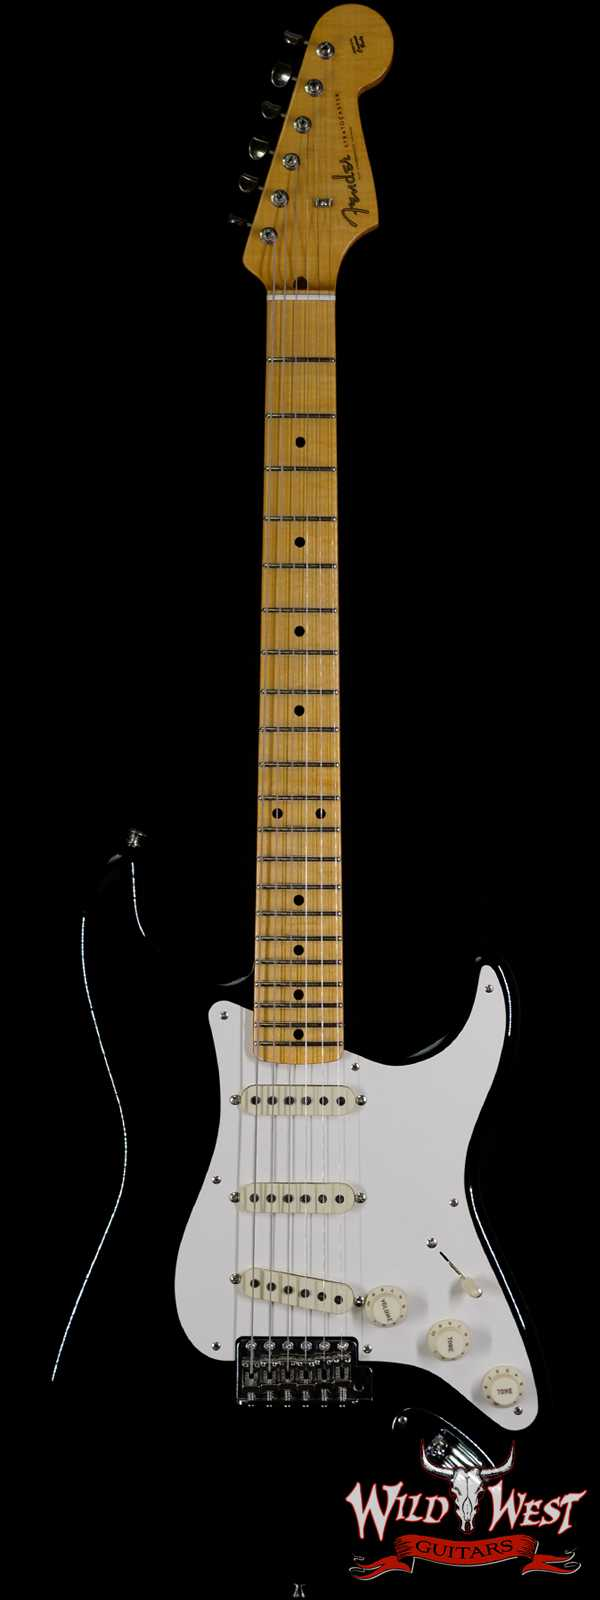 Fender Custom Shop Dennis Galuszka Masterbuilt 50's Stratocaster Lush Closet Classic Black Josefina Hand-Wound Pickups